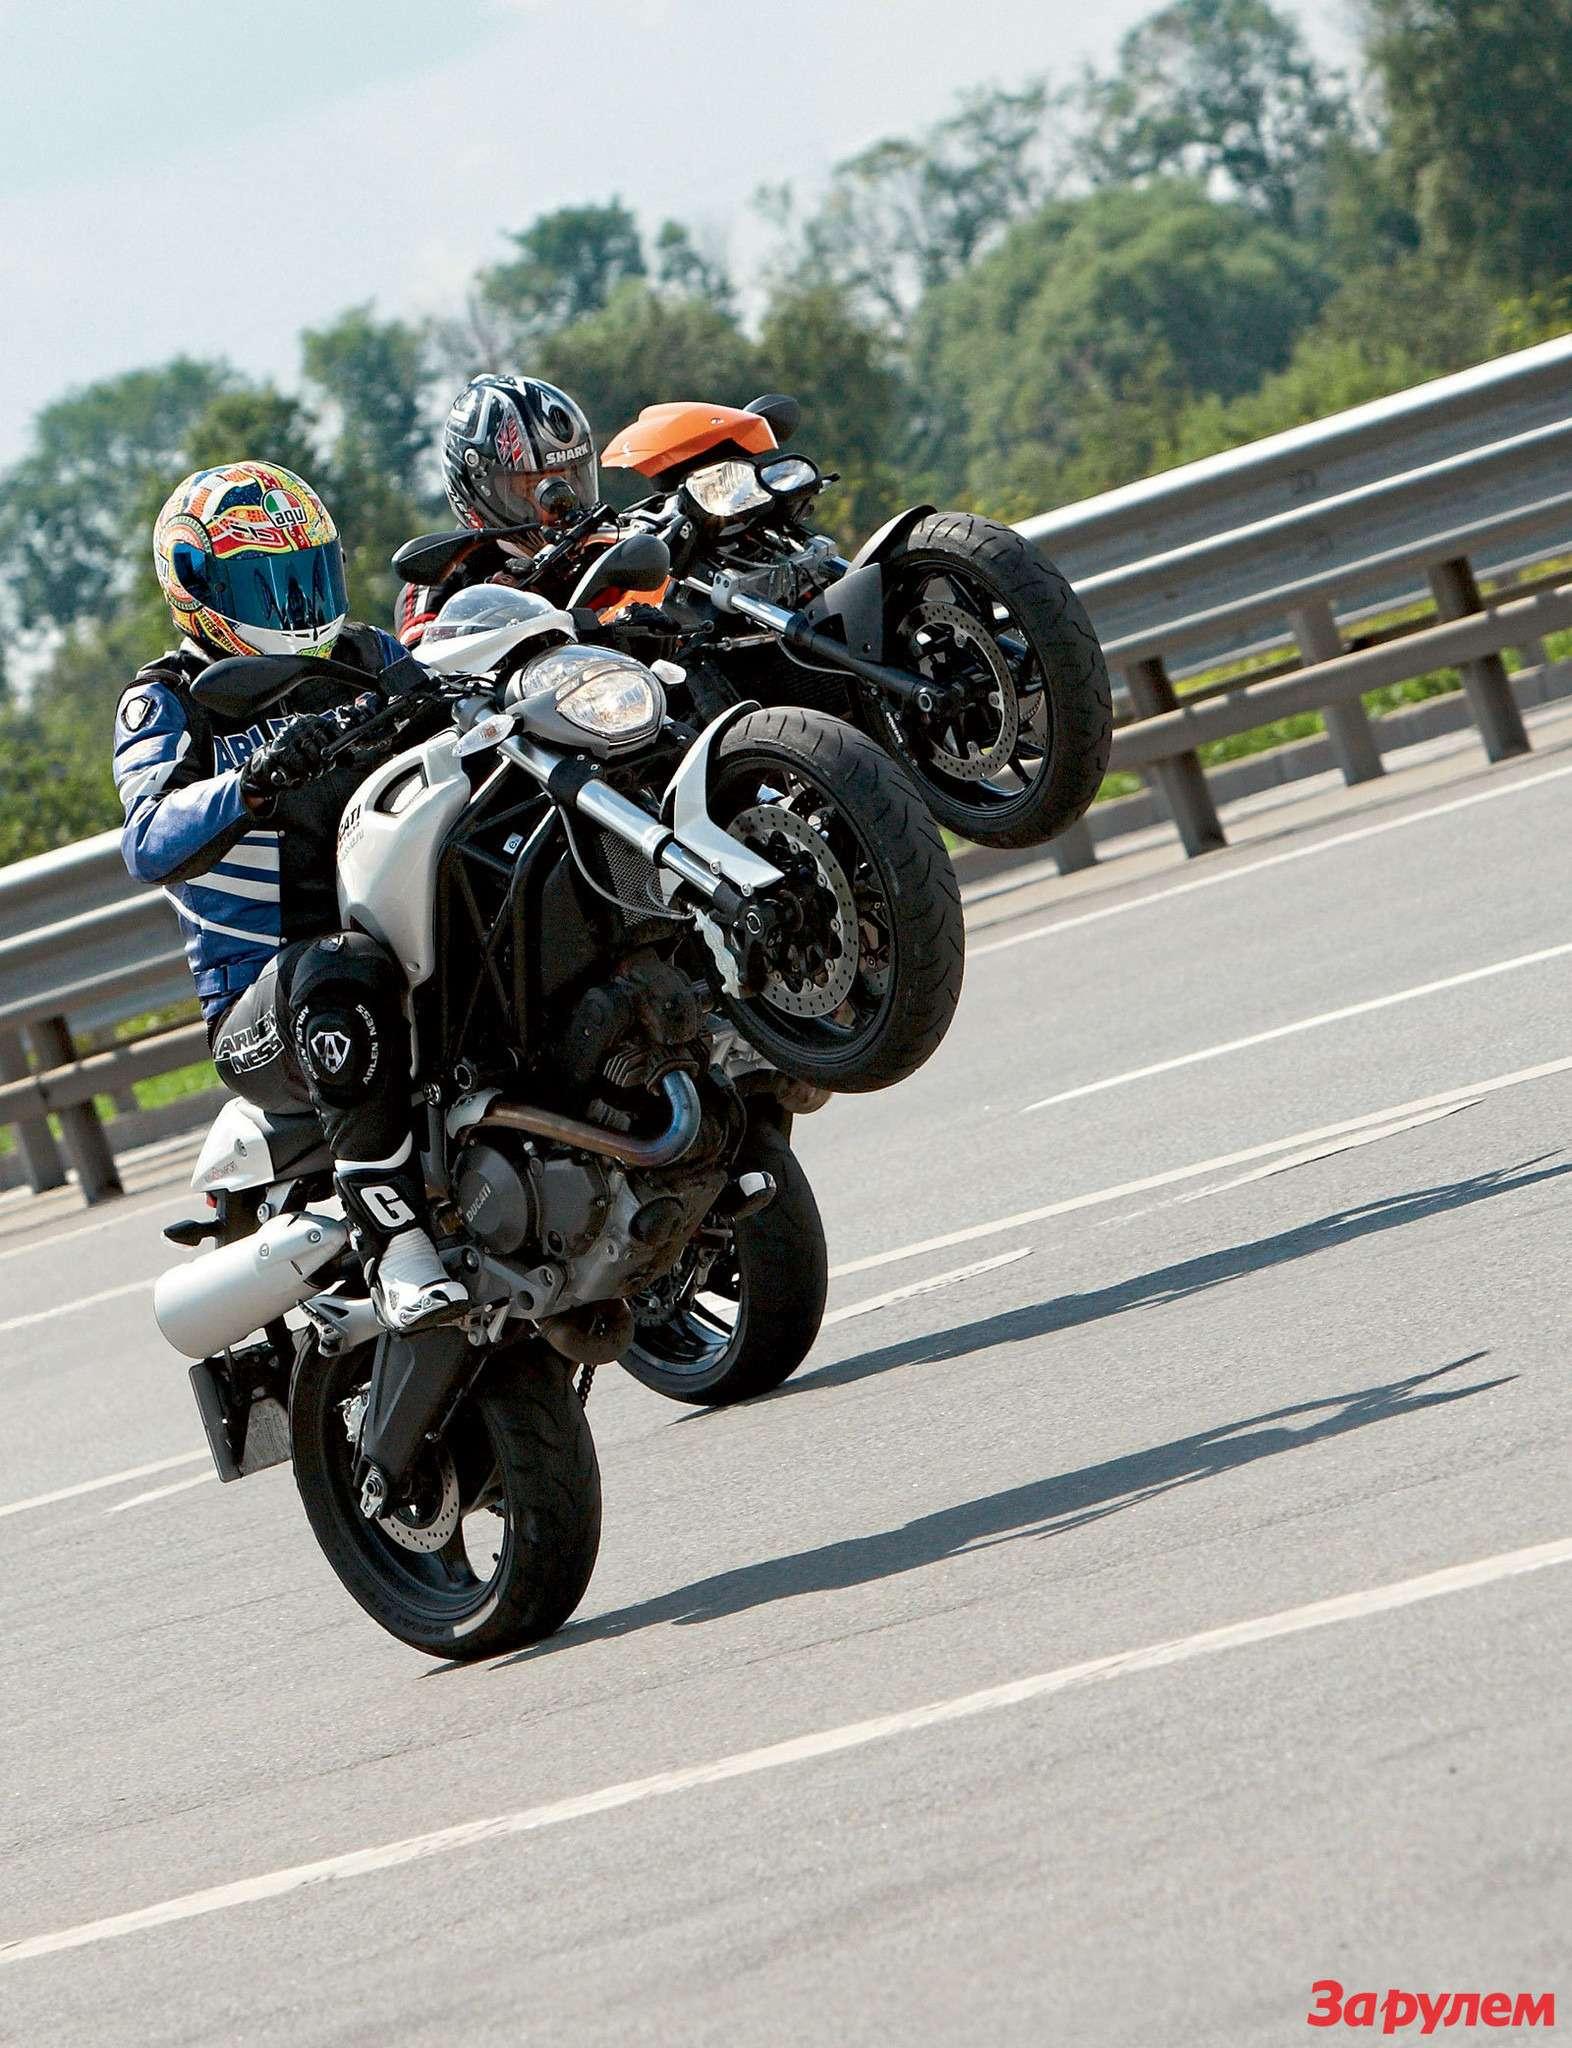 Ducati Monster 696, BMW F800R, Kawasaki ER-6f